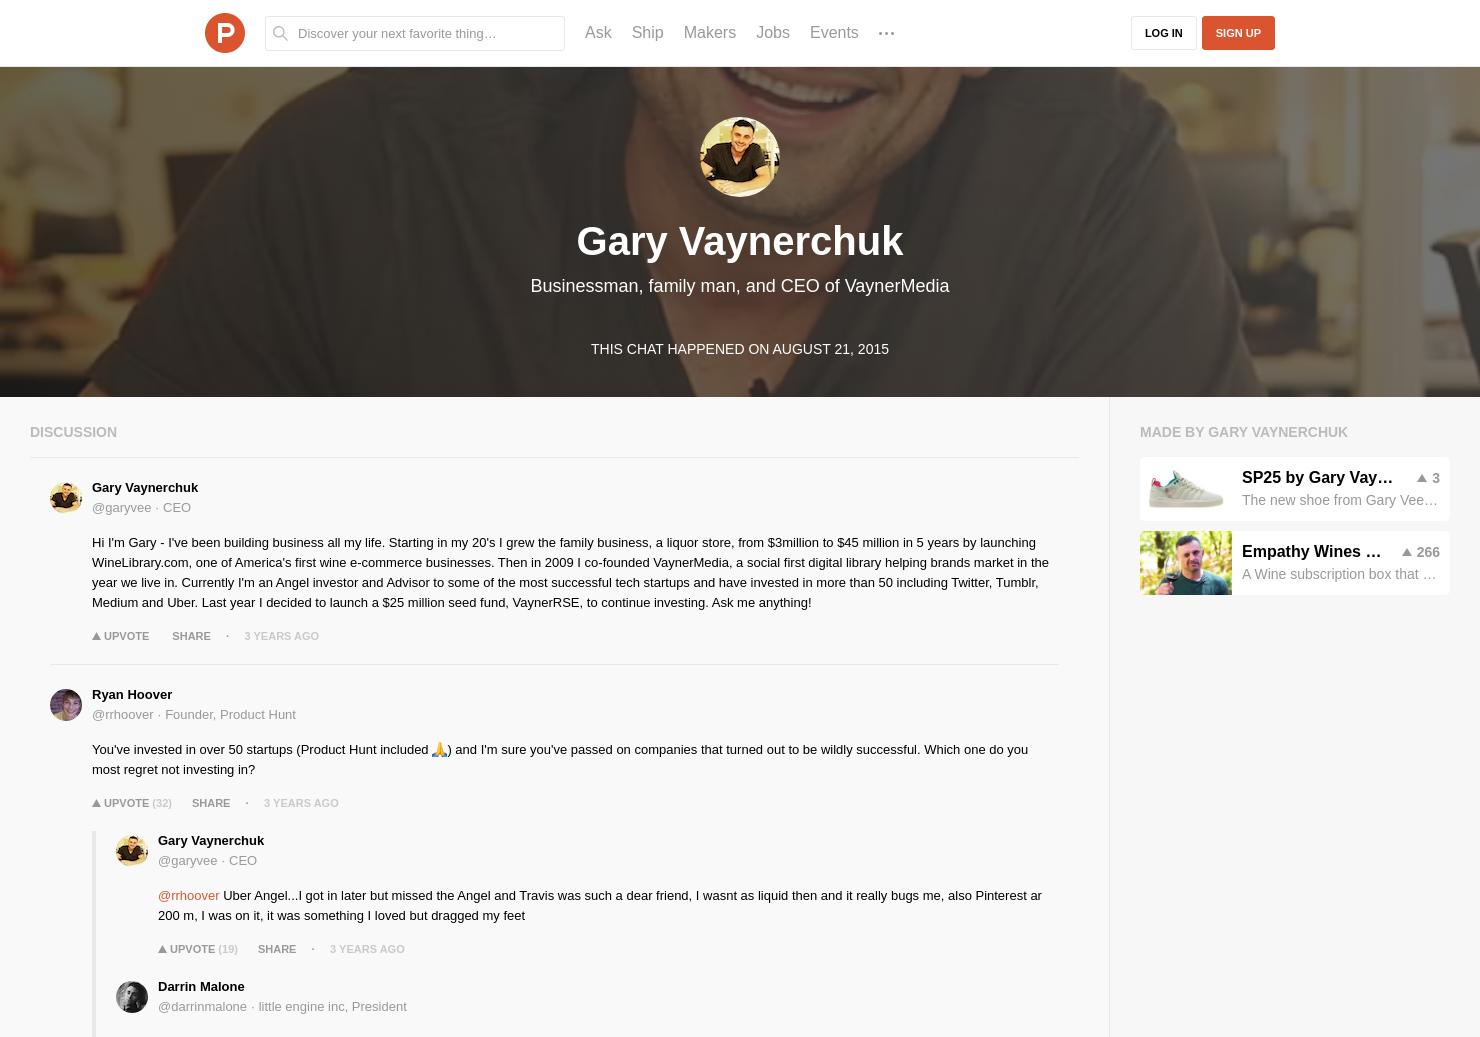 Gary Vaynerchuk LIVE Chat on Product Hunt